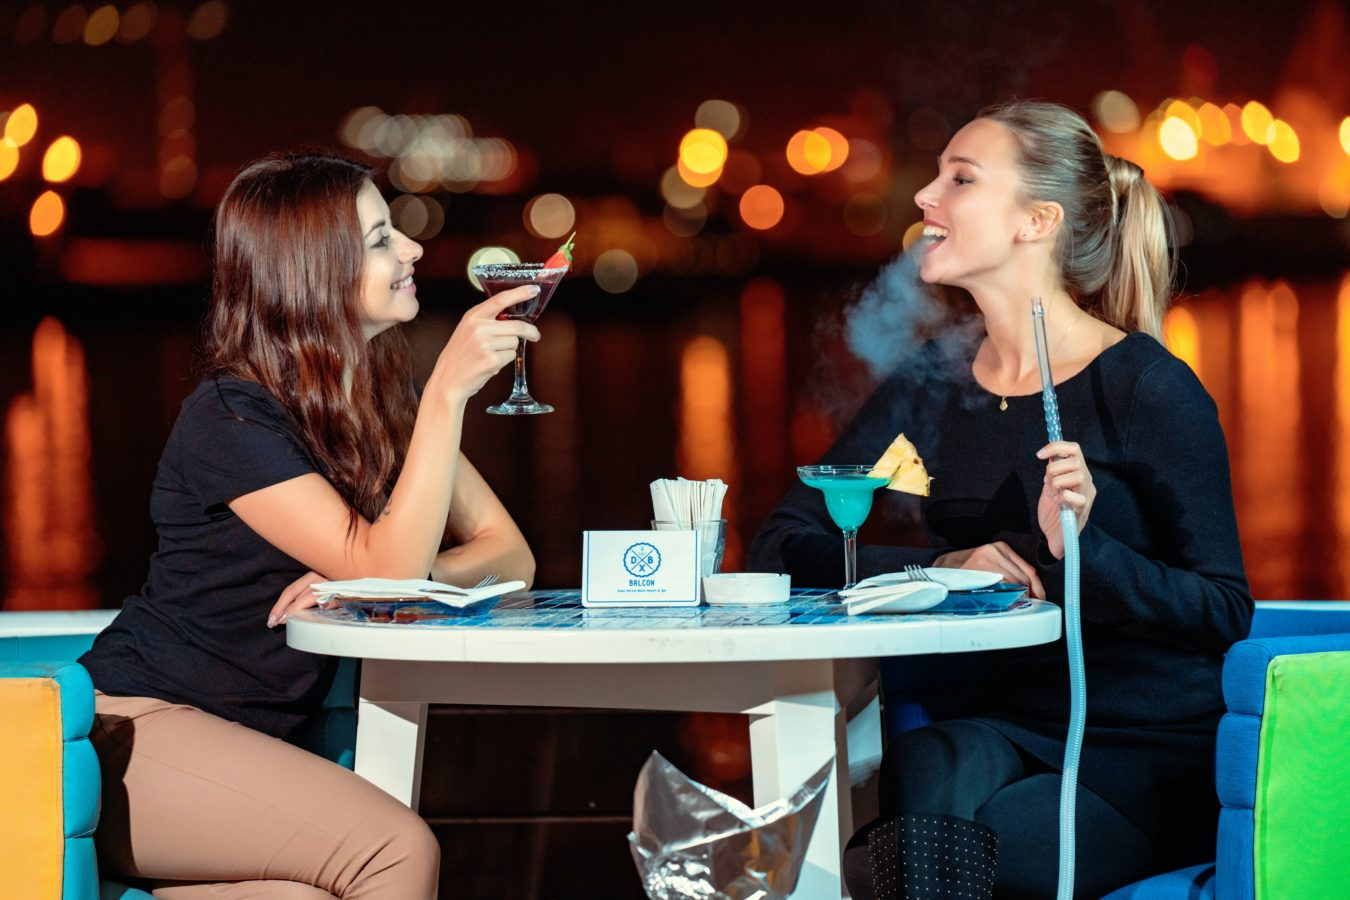 Shisha bars in France are getting popular among Gen Z